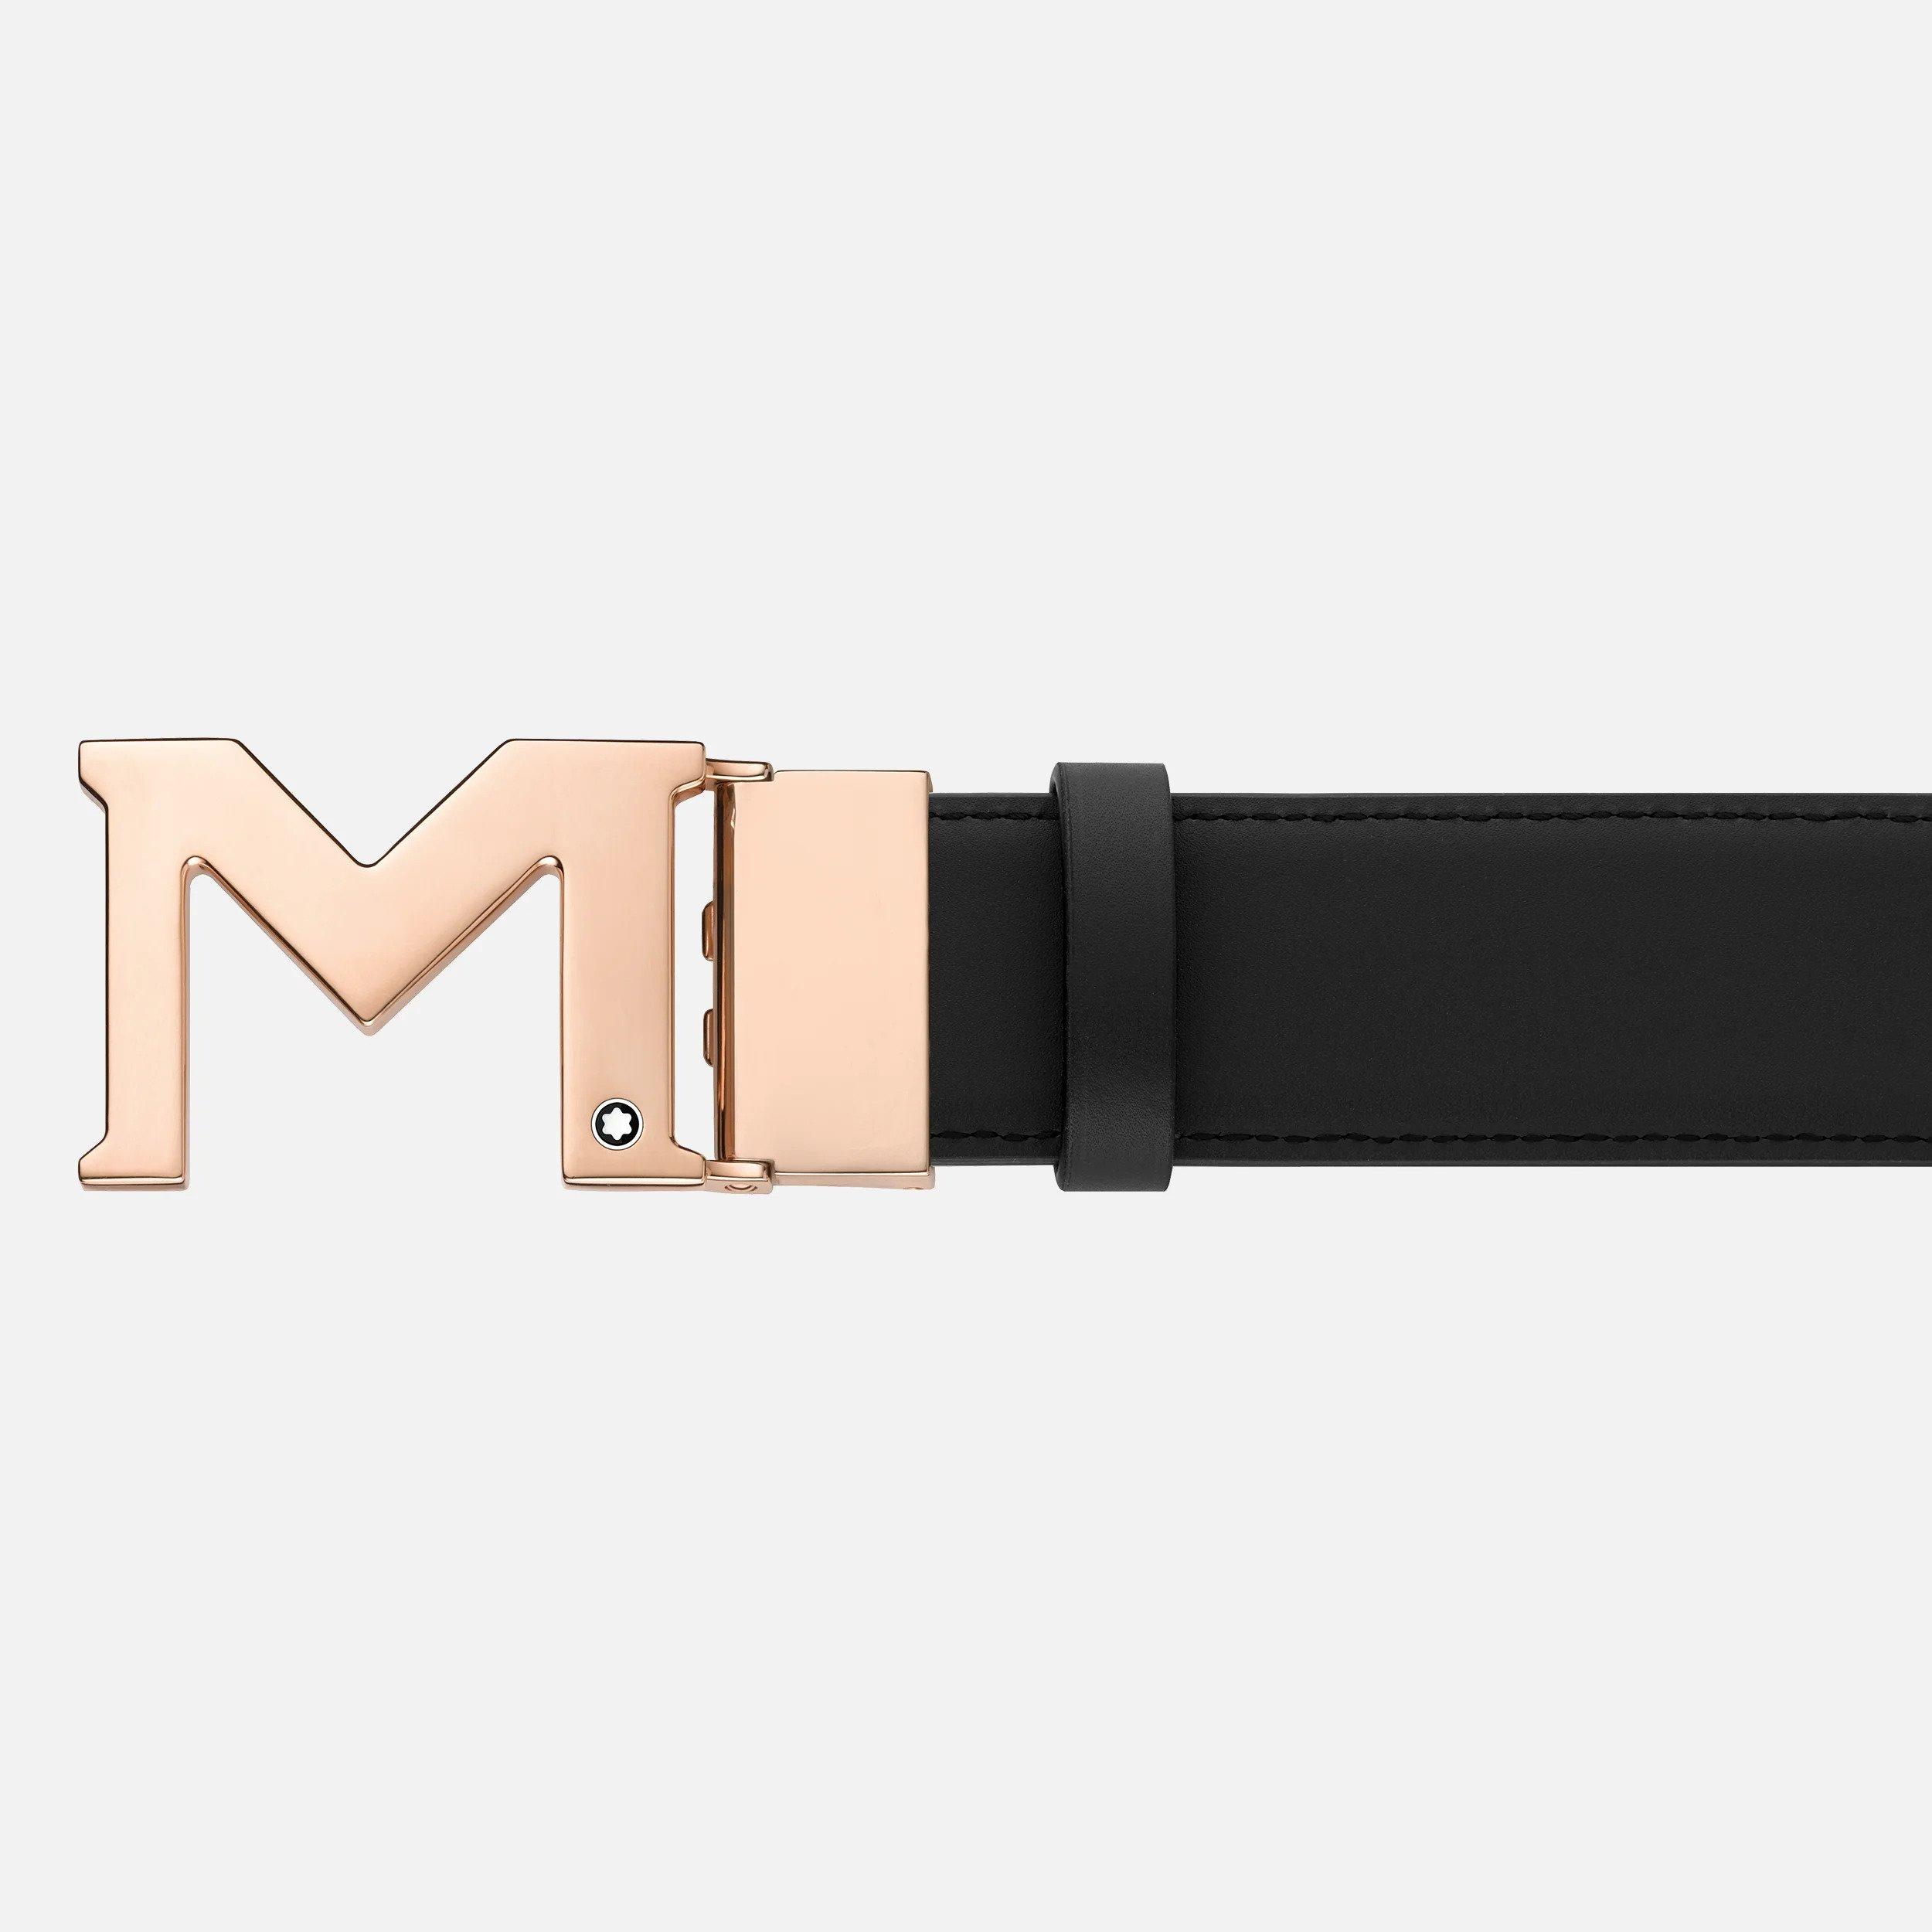 M buckle black blue 35 mm reversible leather belt